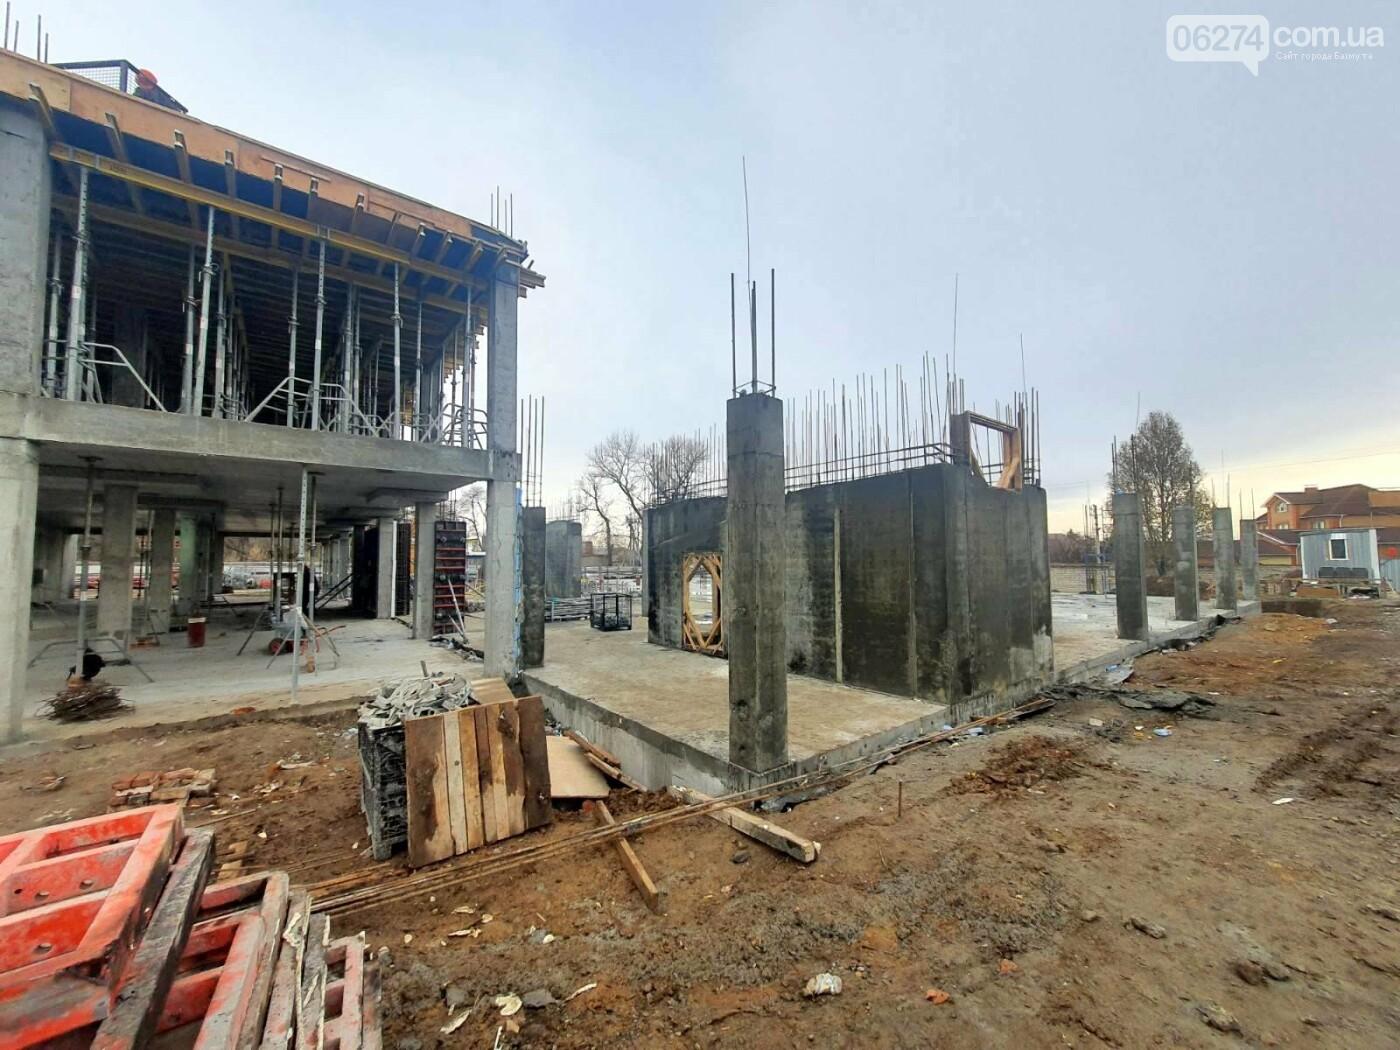 В Бахмуте начали возведение этажей учебного корпуса спортивного колледжа им. С. Бубки, фото-5